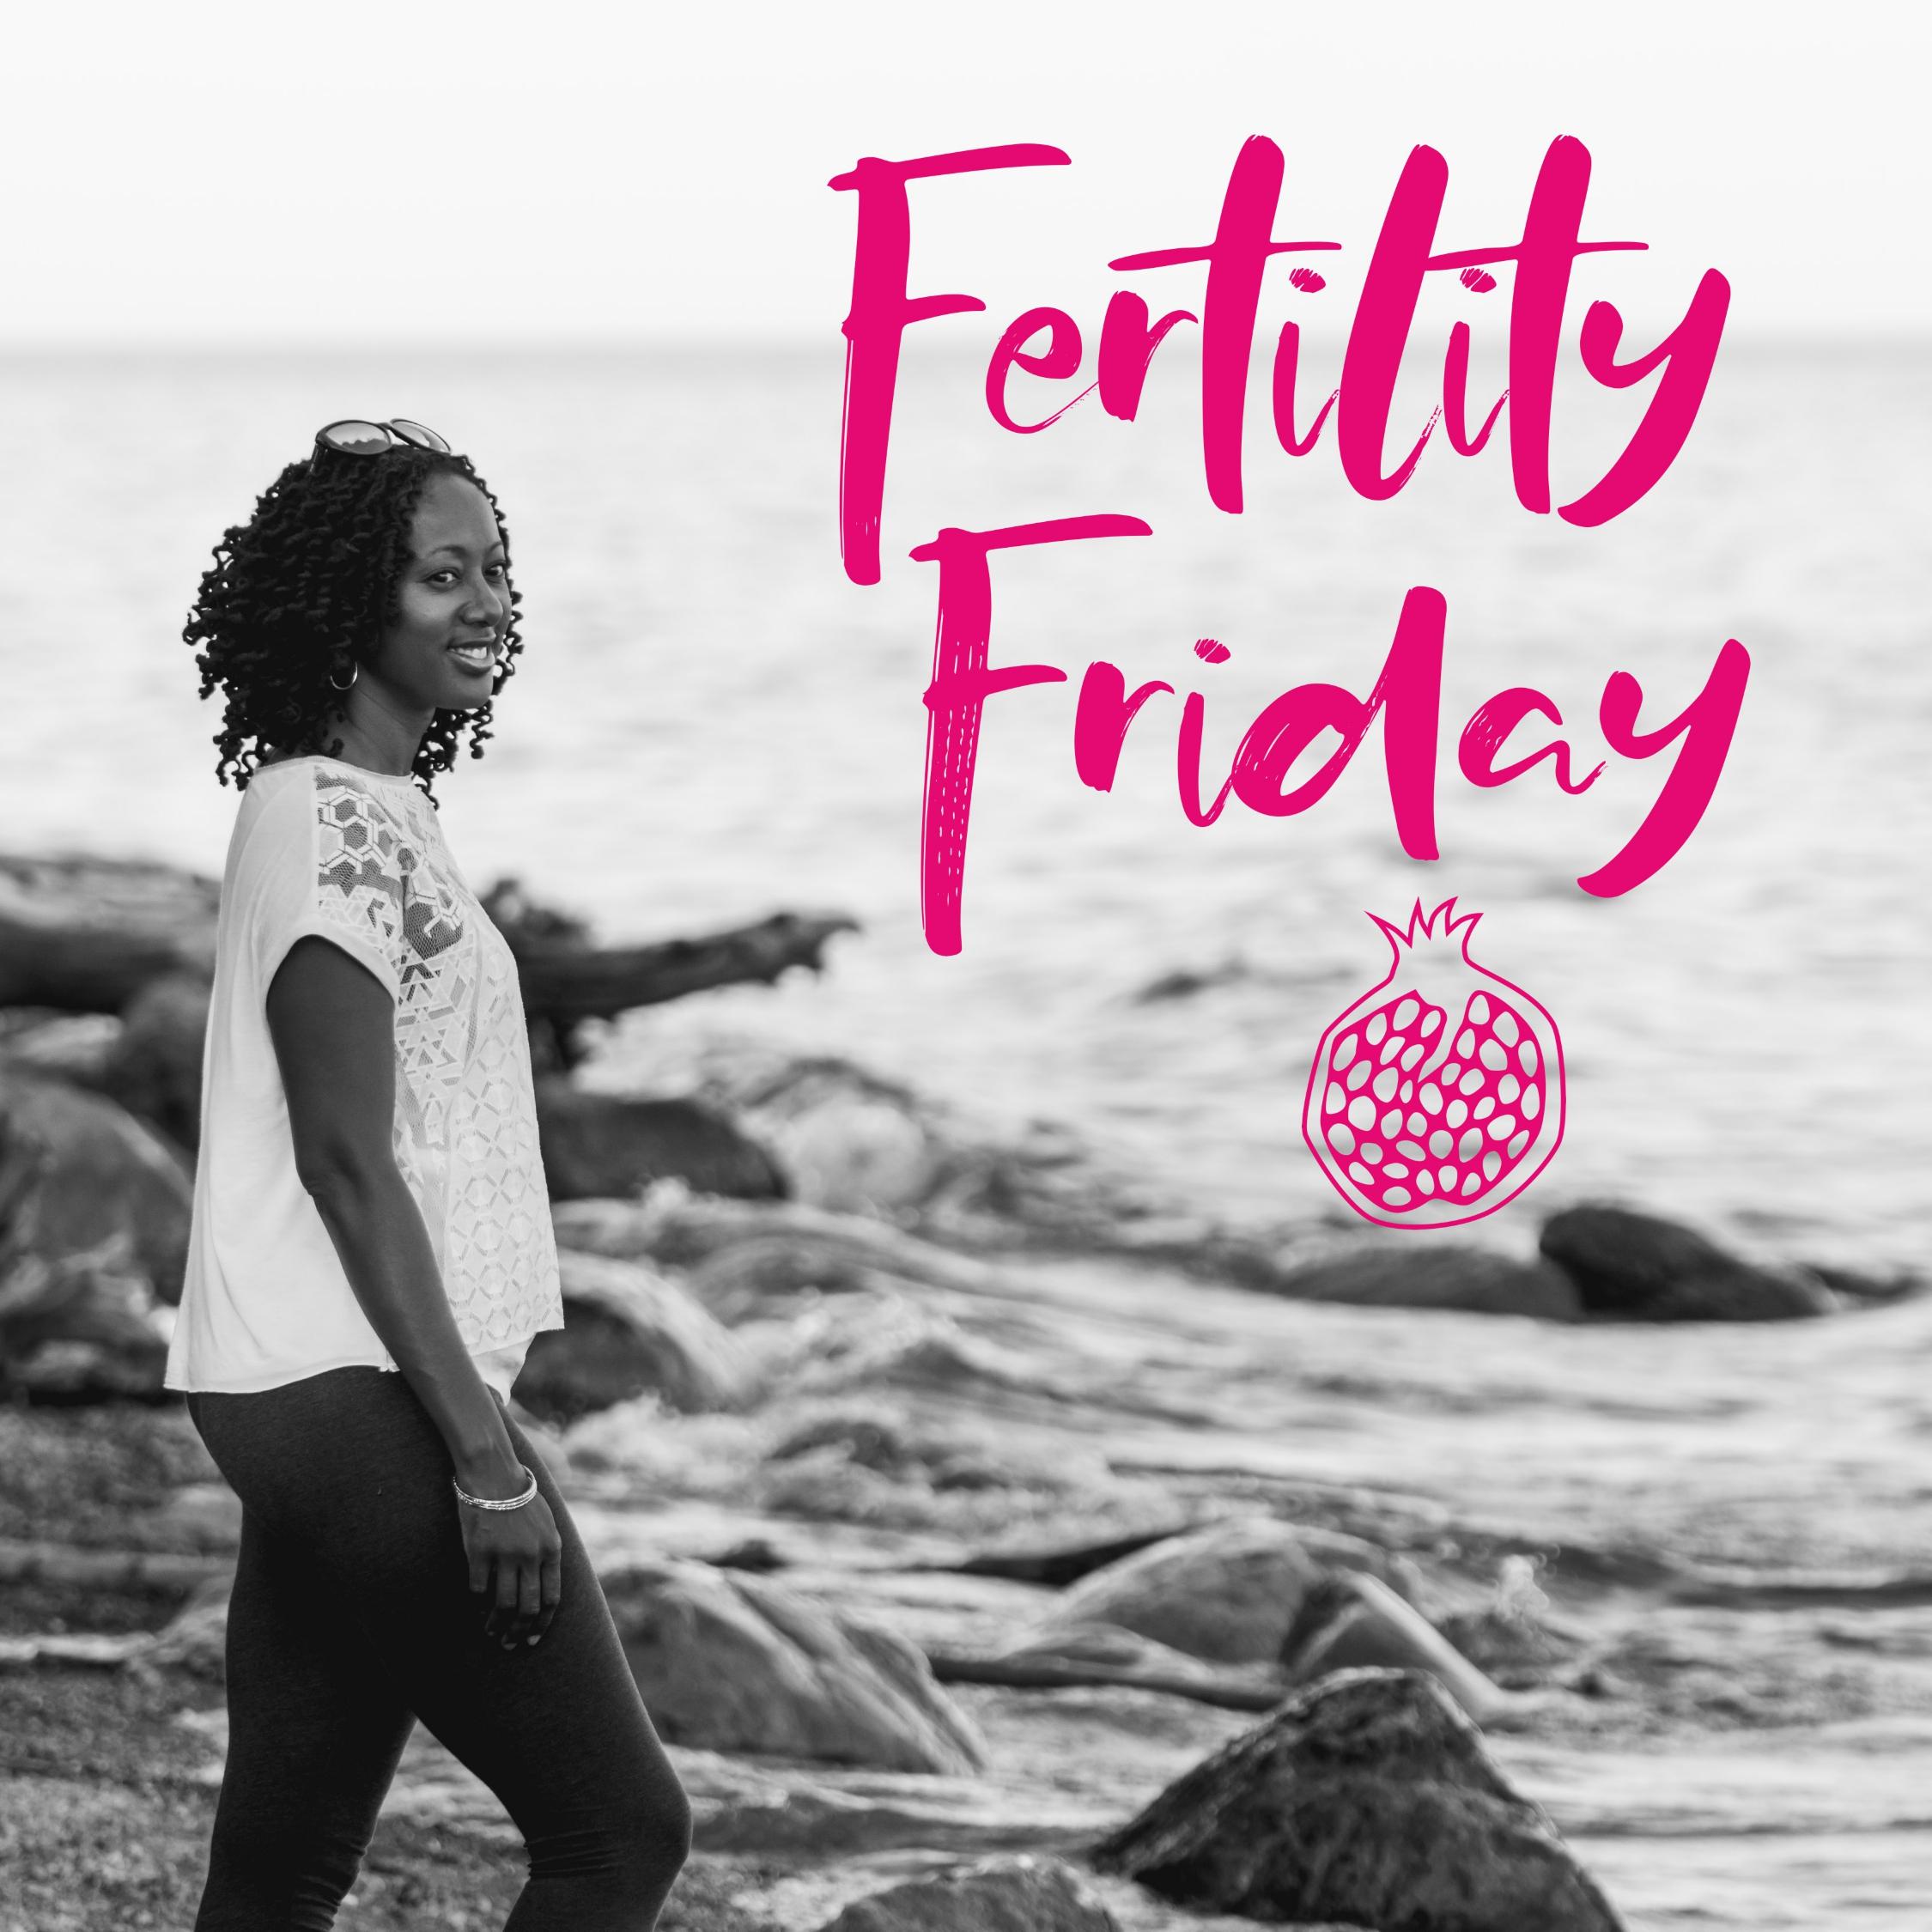 Fertility hormone in orgasm release woman photos 343